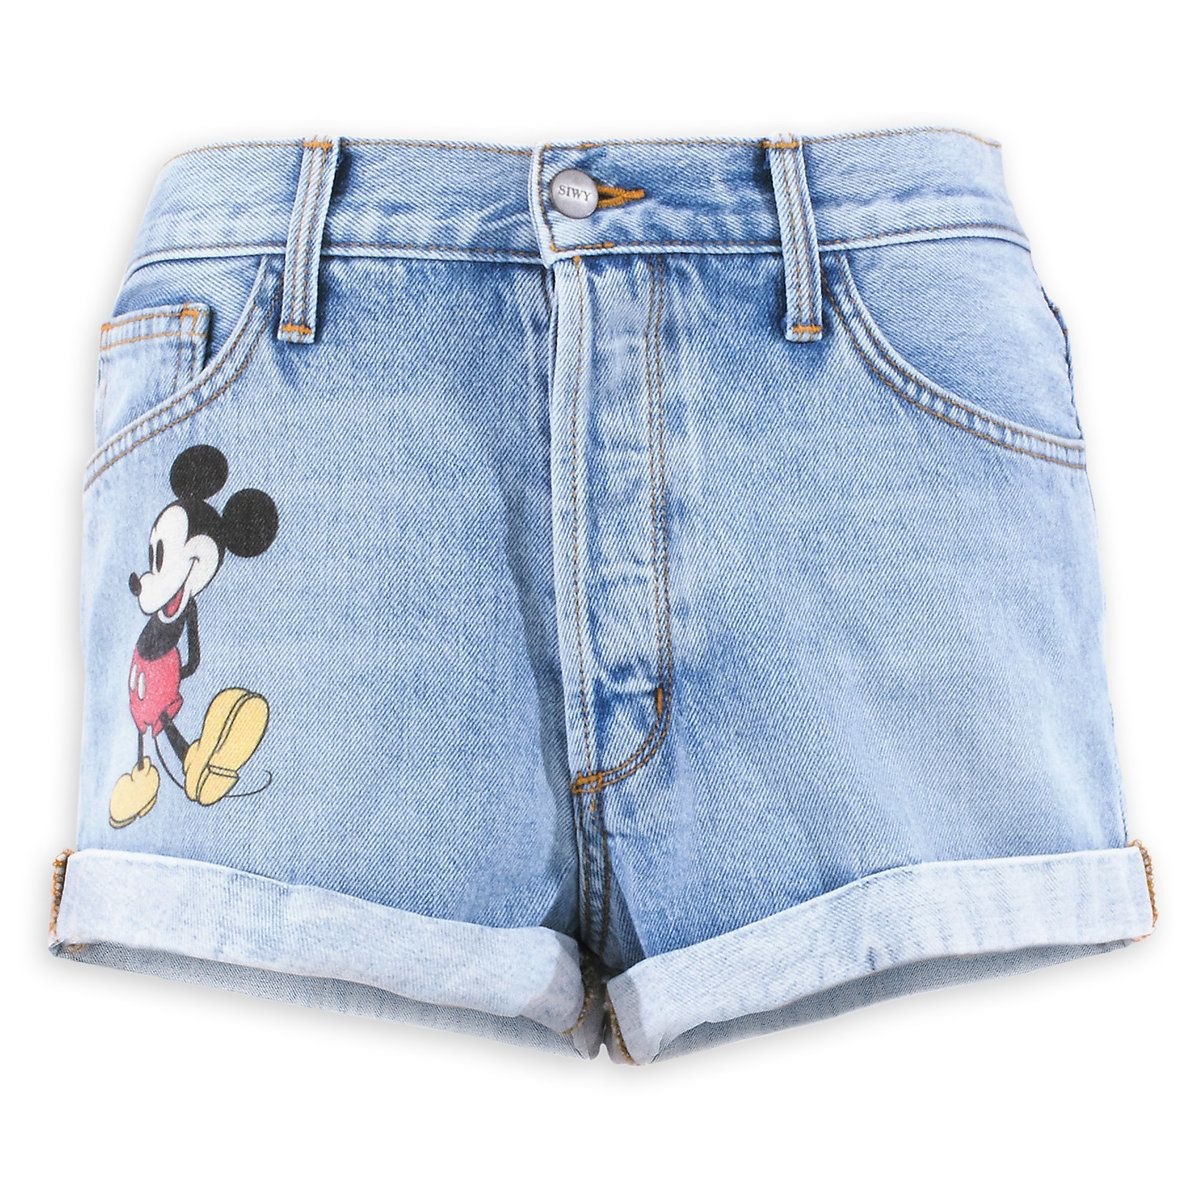 96d75290d7 Mickey Mouse Denim Shorts by SIWY | Closet | Disney shorts, Denim ...